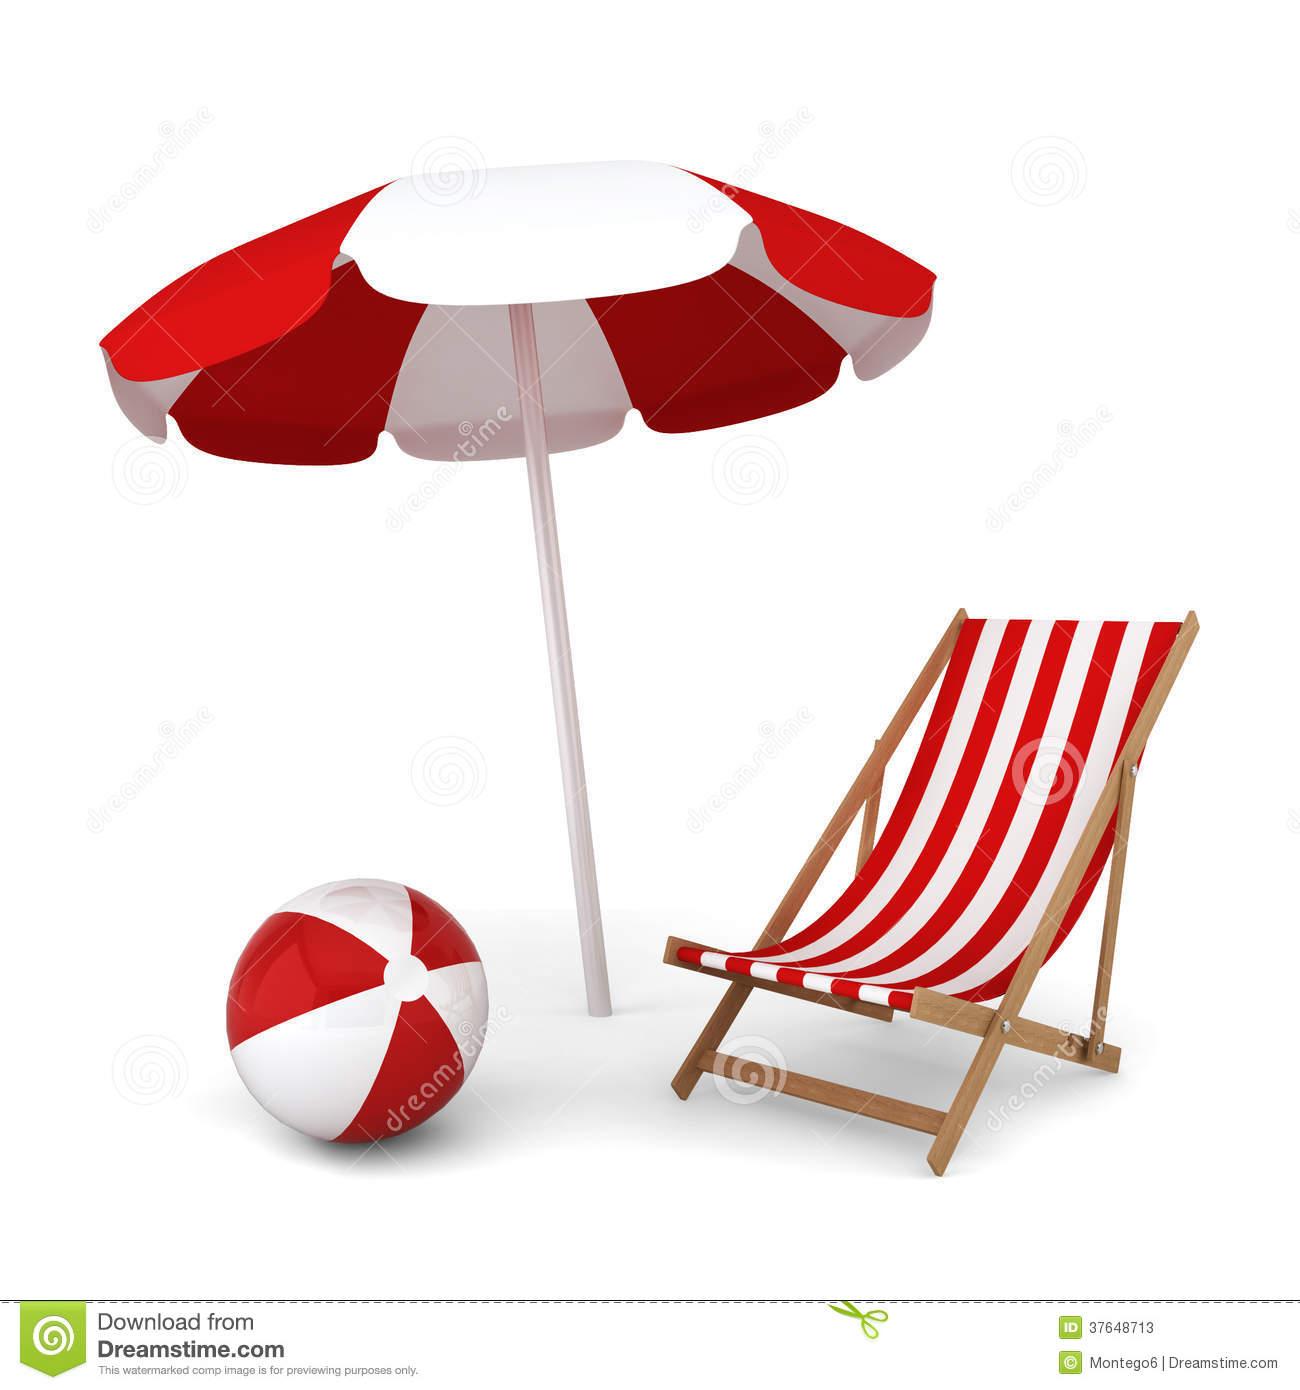 1300x1390 Top Img Beach Chairs Umbrella Large 2196x1118 To Splendiferous  sc 1 st  Clip Art Mag & Beach Chair Cliparts | Free download best Beach Chair Cliparts on ...